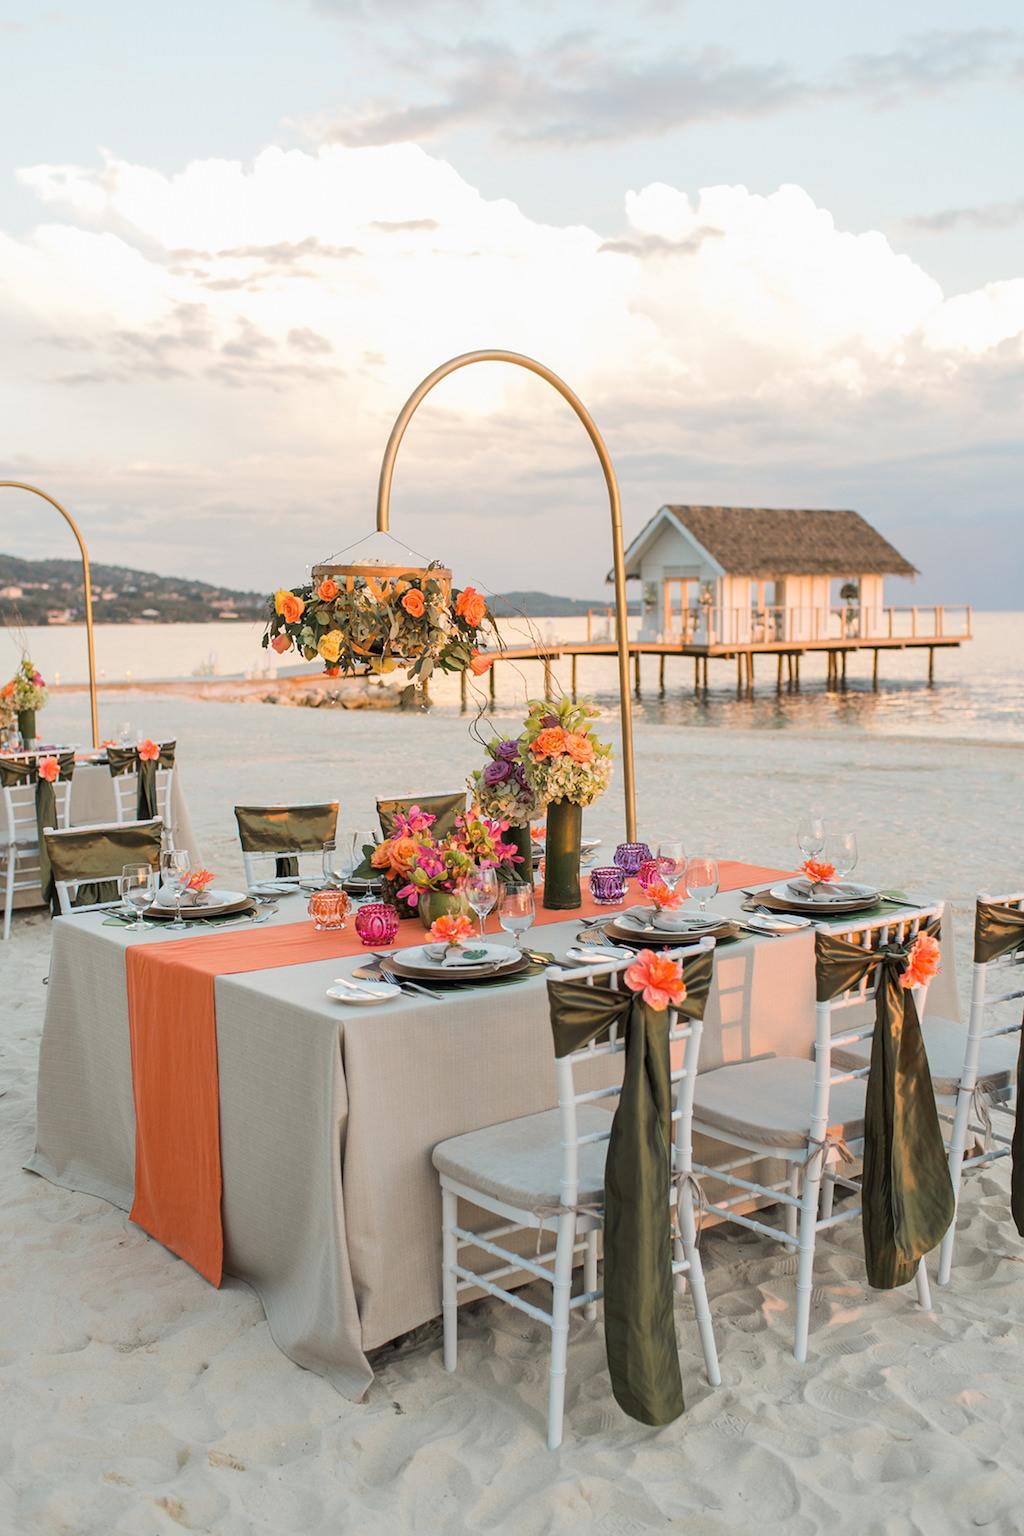 Sandals South Coast Jamaica Destination Caribbean Wedding Tropical Beach Wedding Reception Decor and Centerpieces | Alexis June Weddings